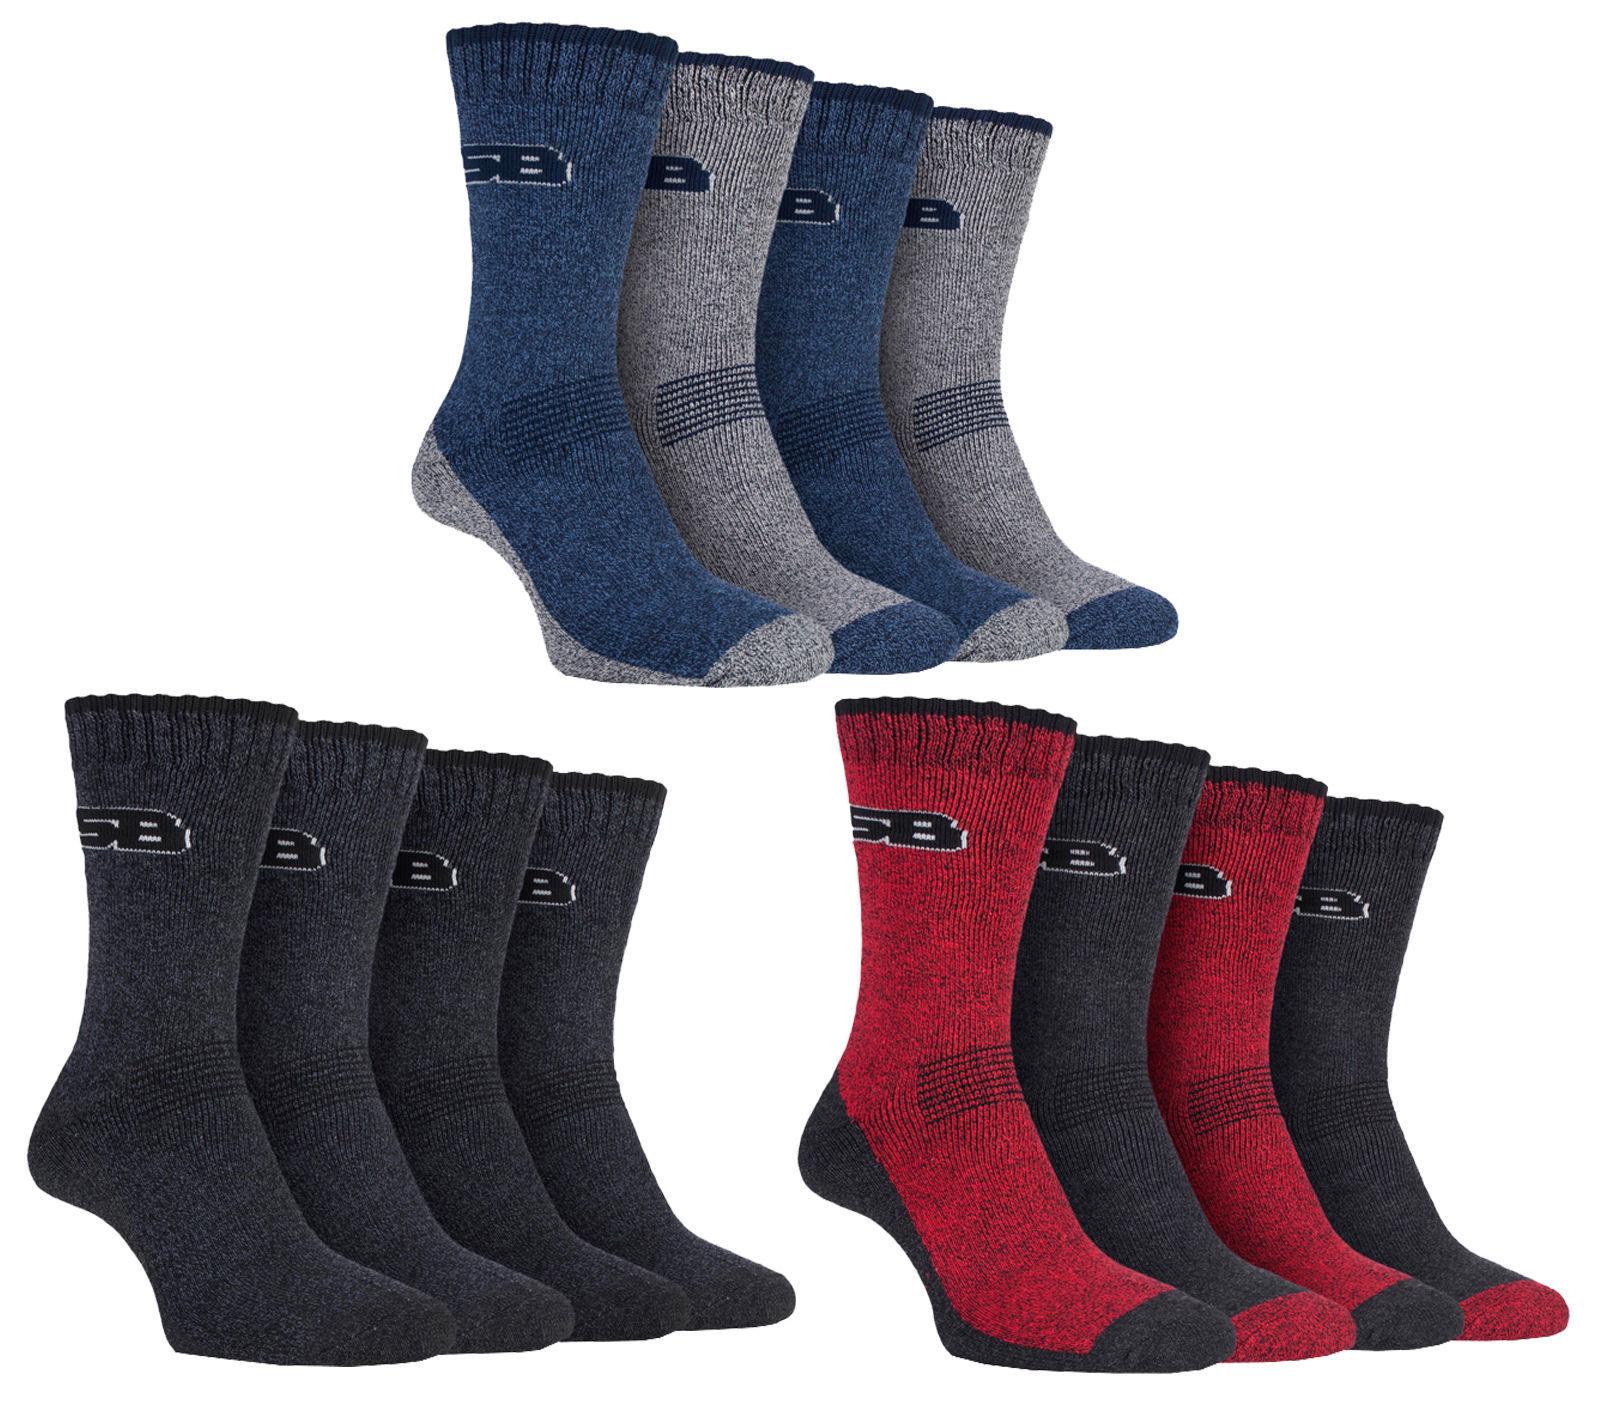 Storm Bloc - 4 Pack Mens Lightweight Summer Hiking Work Socks for Hot Weather - $14.99